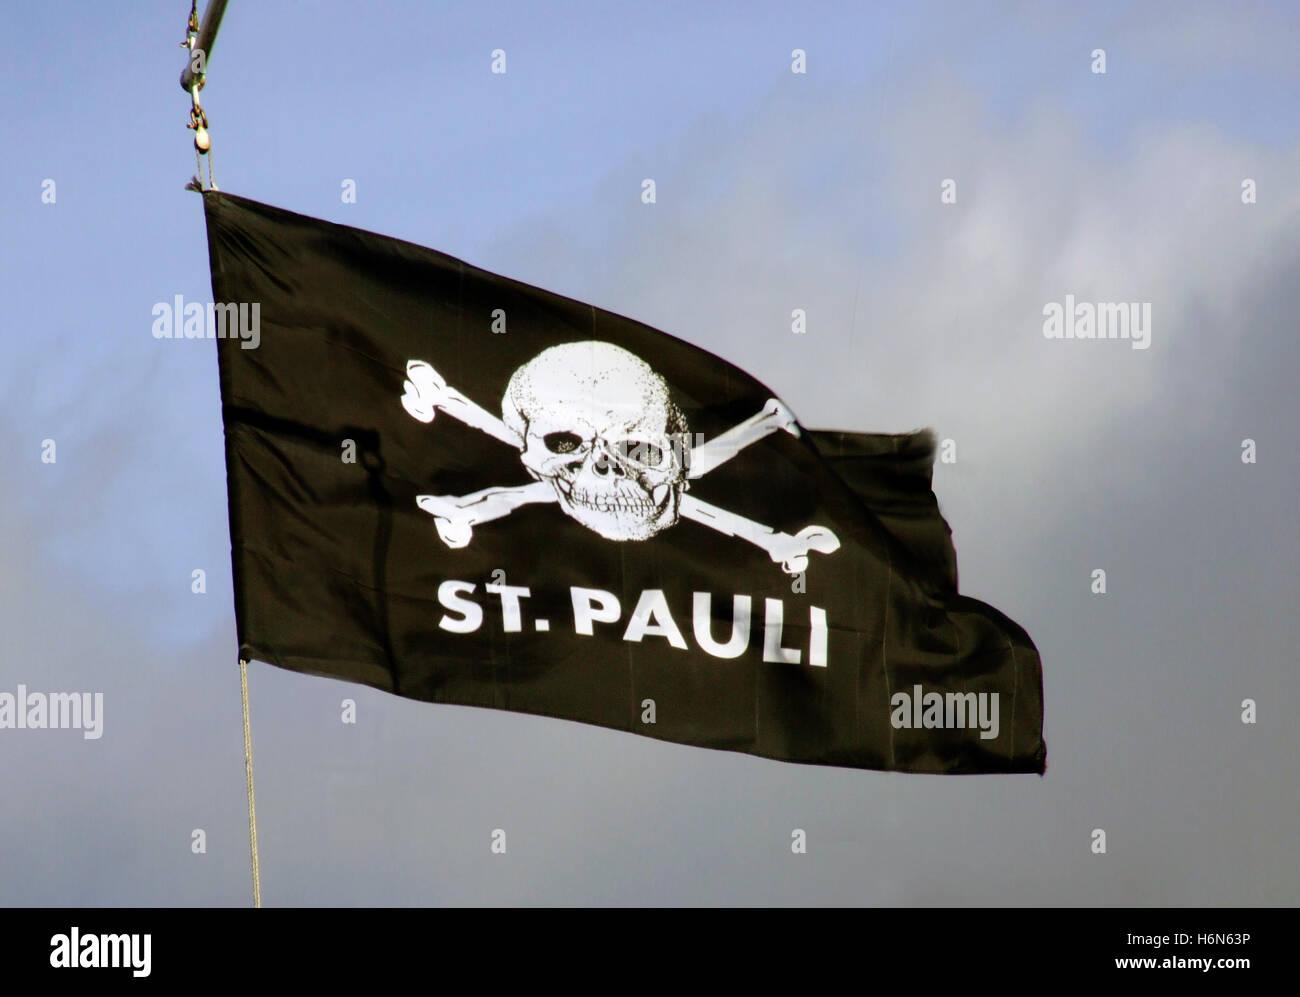 signs symbols - Stock Image